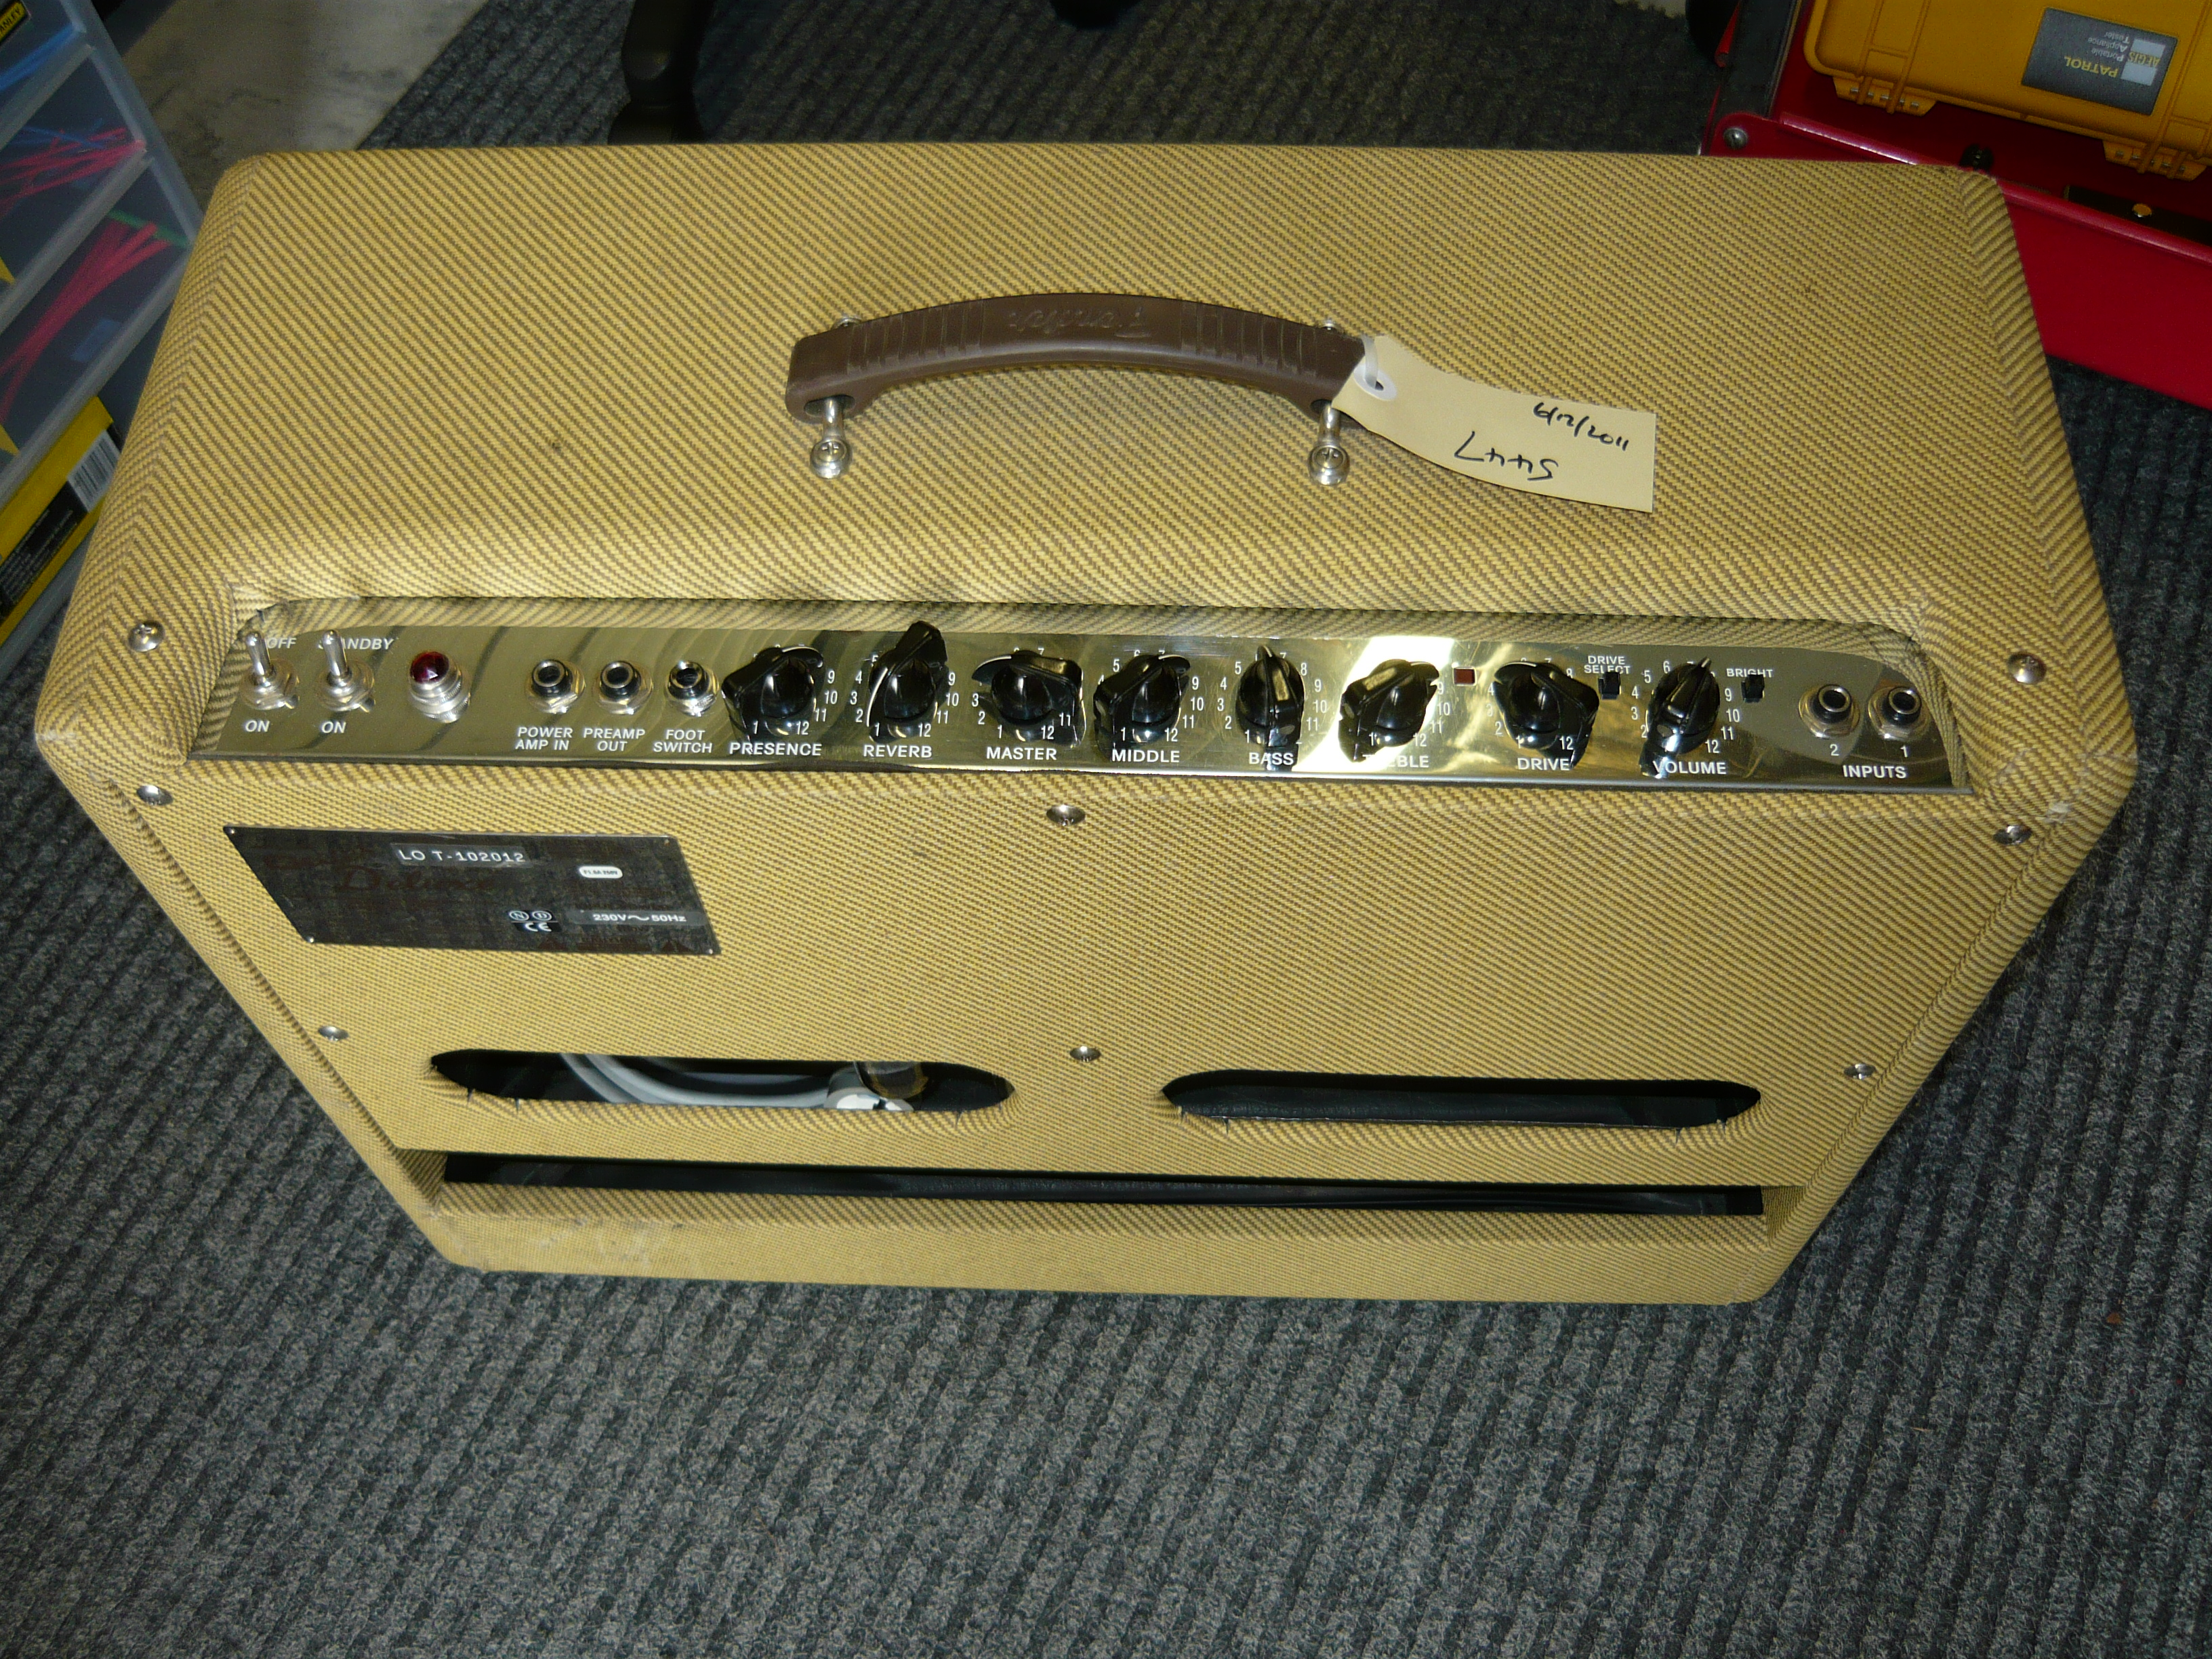 Harmonica Amp Input Jack Wiring Simple Electronic Circuits Fender Modifying Popular Valve Guitar Amps For The Blues Harp Player Rh Ivanrichards Com Au Speaker Strat